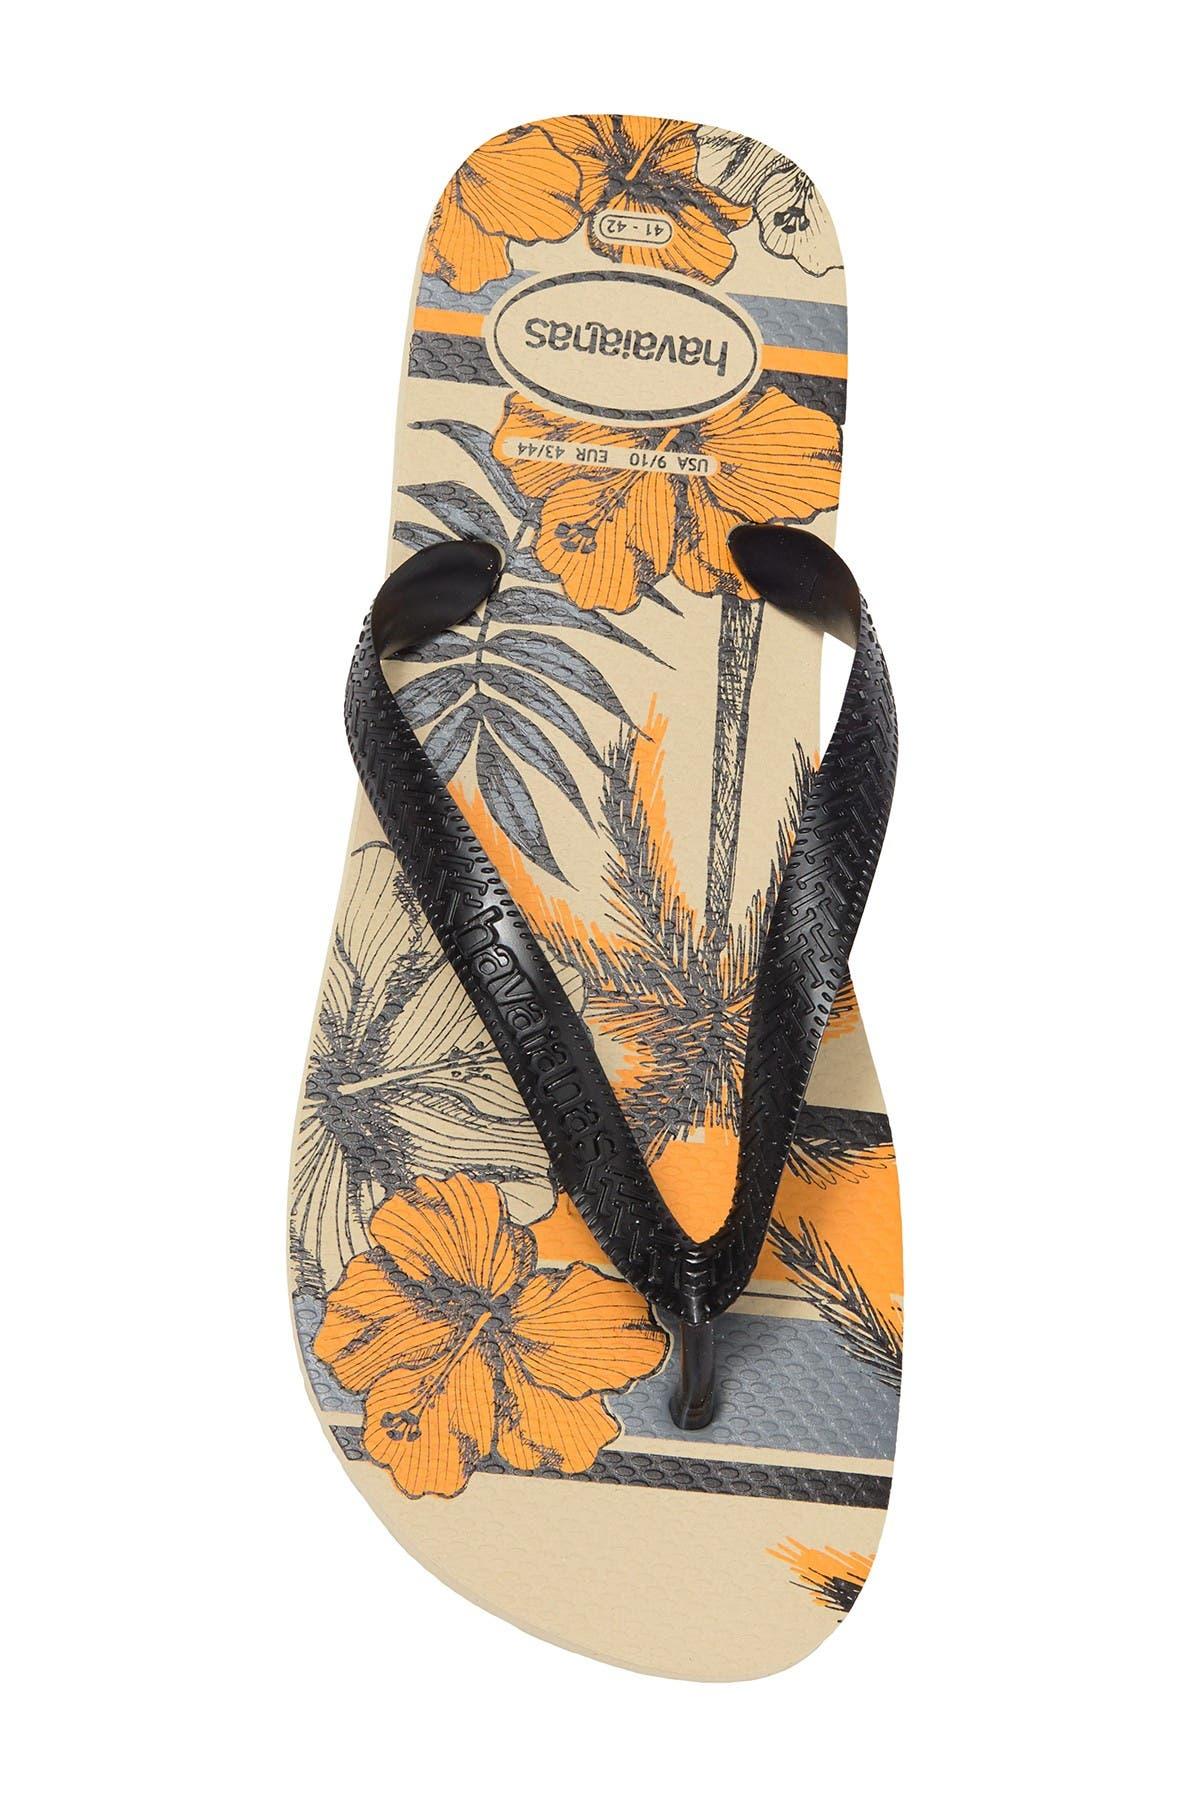 Image of Havaianas Aloha Flip Flop